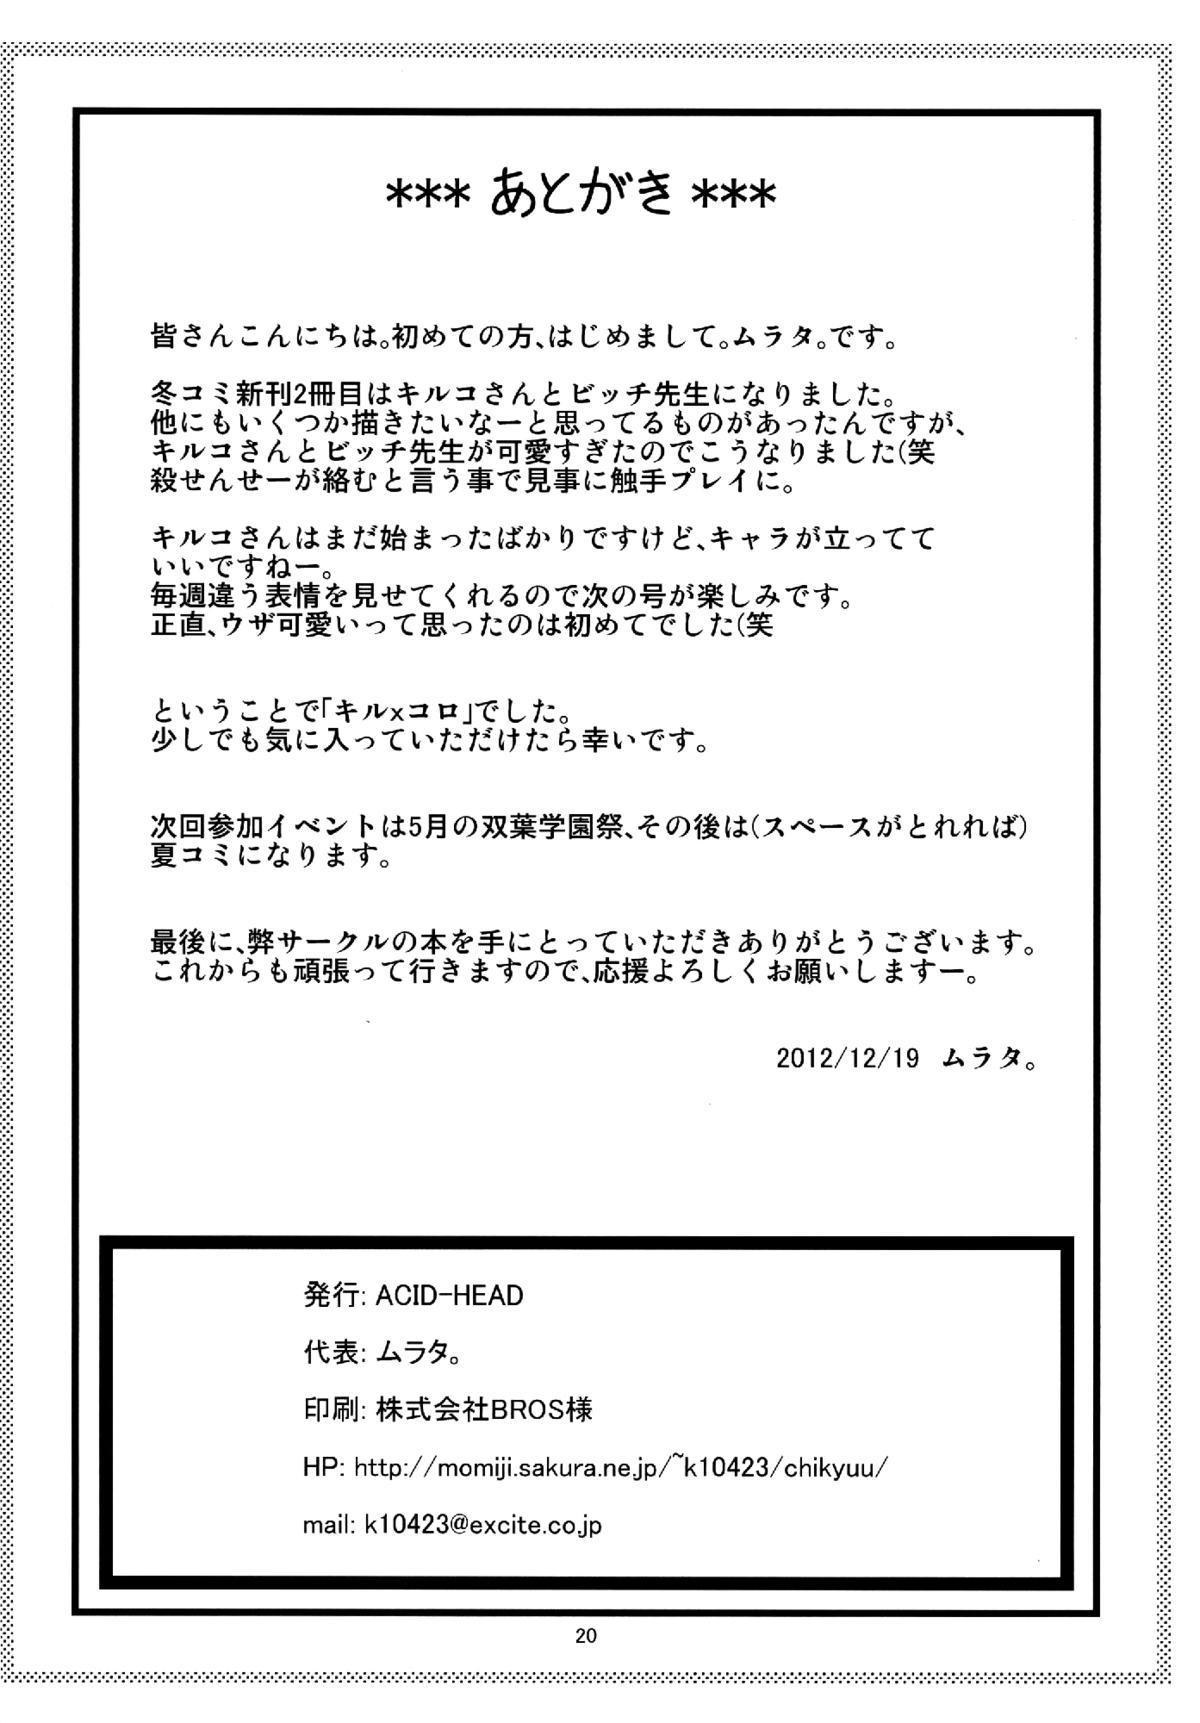 Kiru × Koro 21